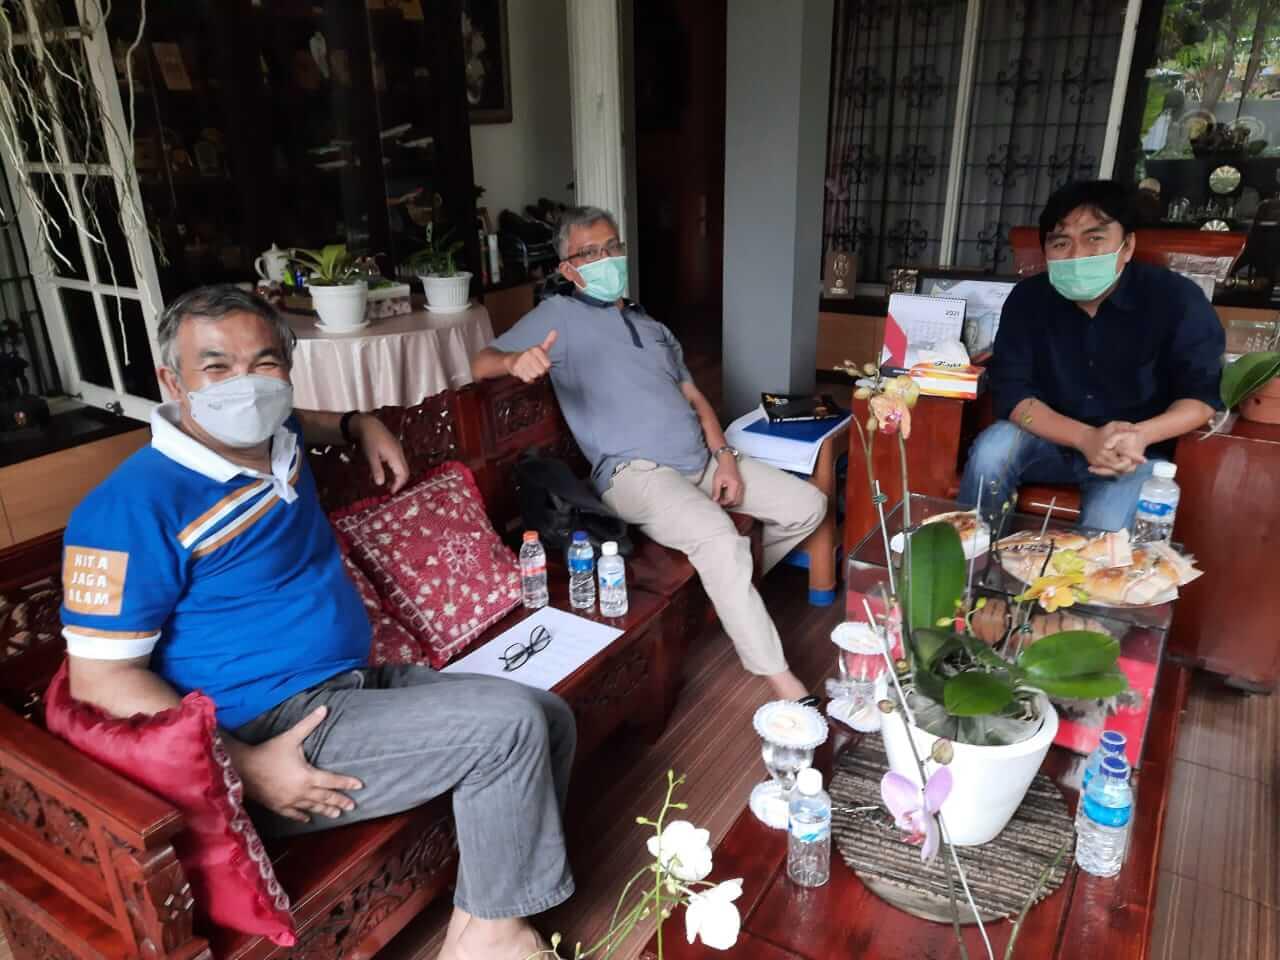 Chief Executive Officer (CEO) PT Paragon Technology and Innovation (PTI) Salman Subakat (kanan), wartawan senior Nurcholis MA Basyari (tengah), dan Pakar Komunikasi dan Motivator Nasional Dr Aqua Dwipayana saat silaturahim di Kompleks Perumahan Cimanggu Permai, Bogor, Jawa Barat. (Foto:Dok/Tugu Jatim)